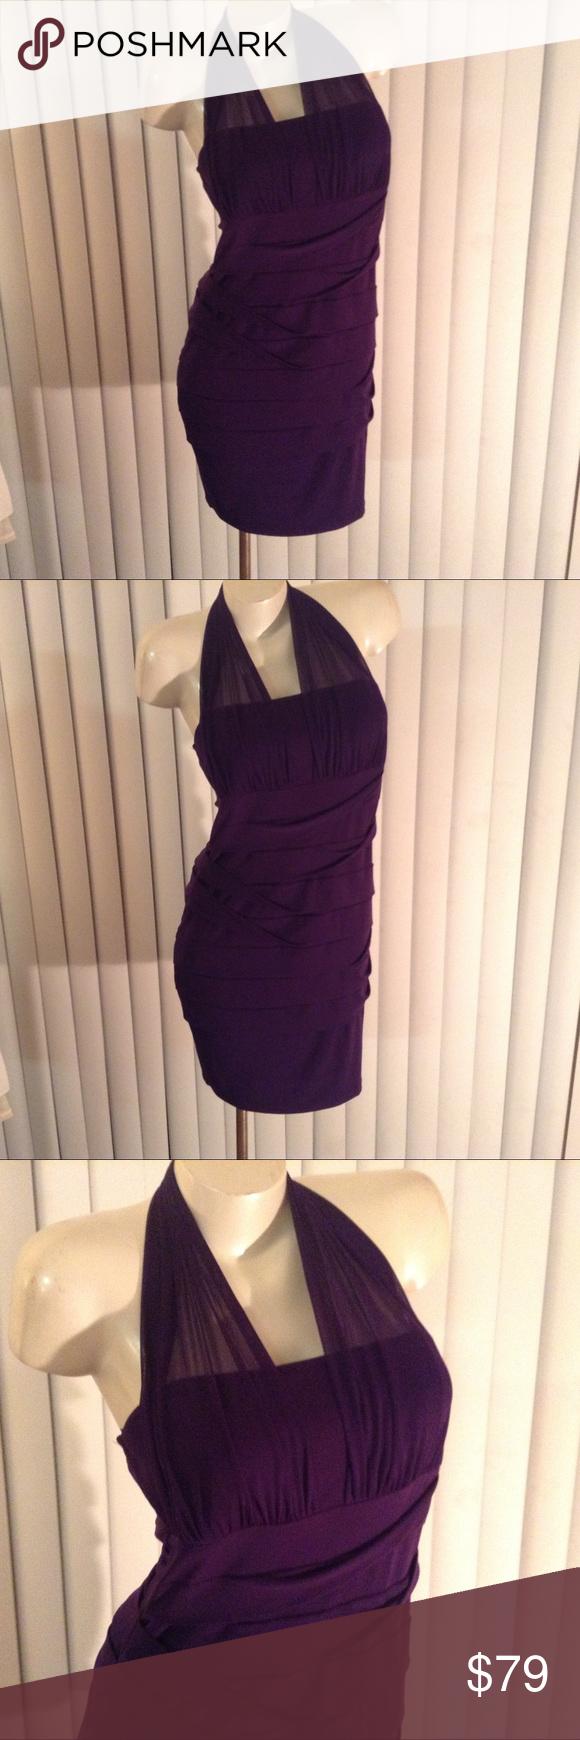 En Focus Studio Dress Grape Dress Dresses Fashion